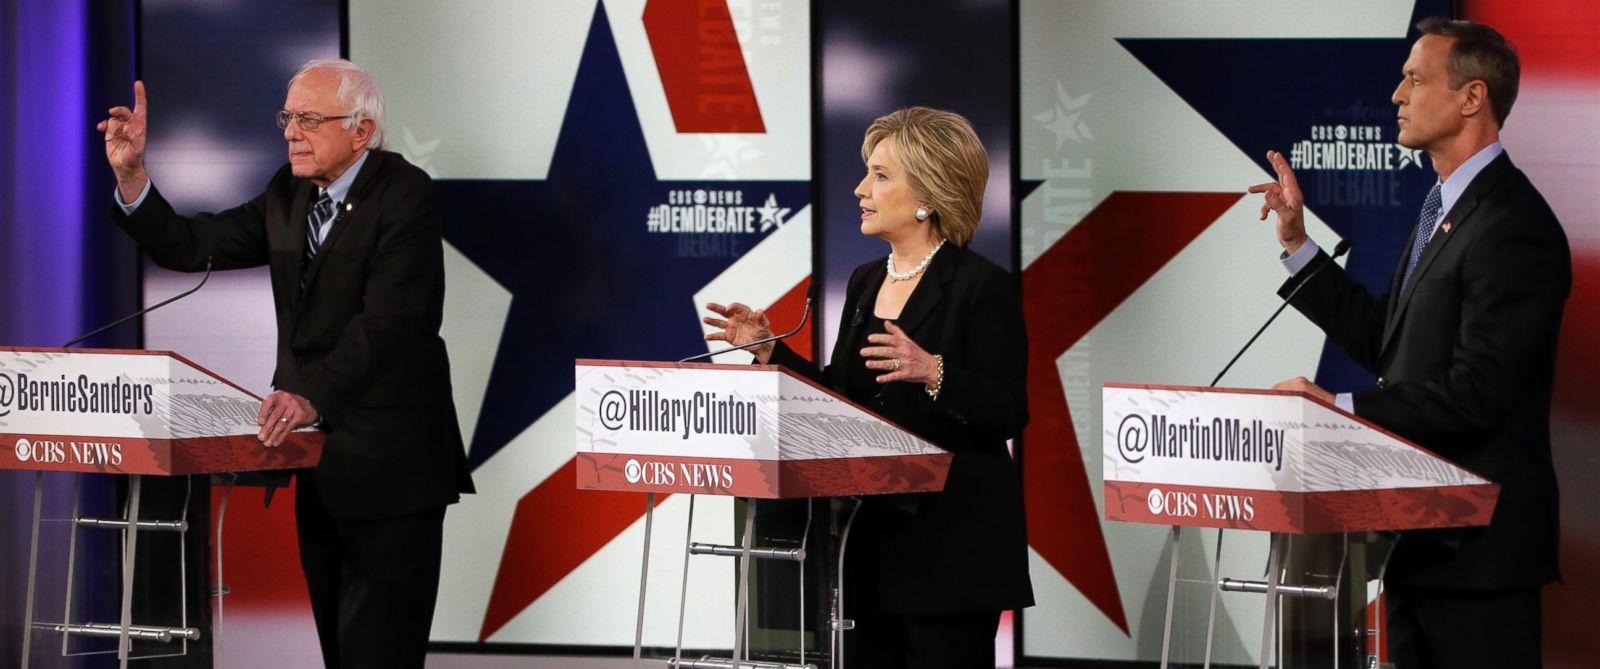 PHOTO: Democratic presidential candidates Bernie Sanders, left, Hillary Rodham Clinton and Martin OMalley participate in a Democratic presidential primary debate, Nov. 14, 2015, in Des Moines, Iowa.